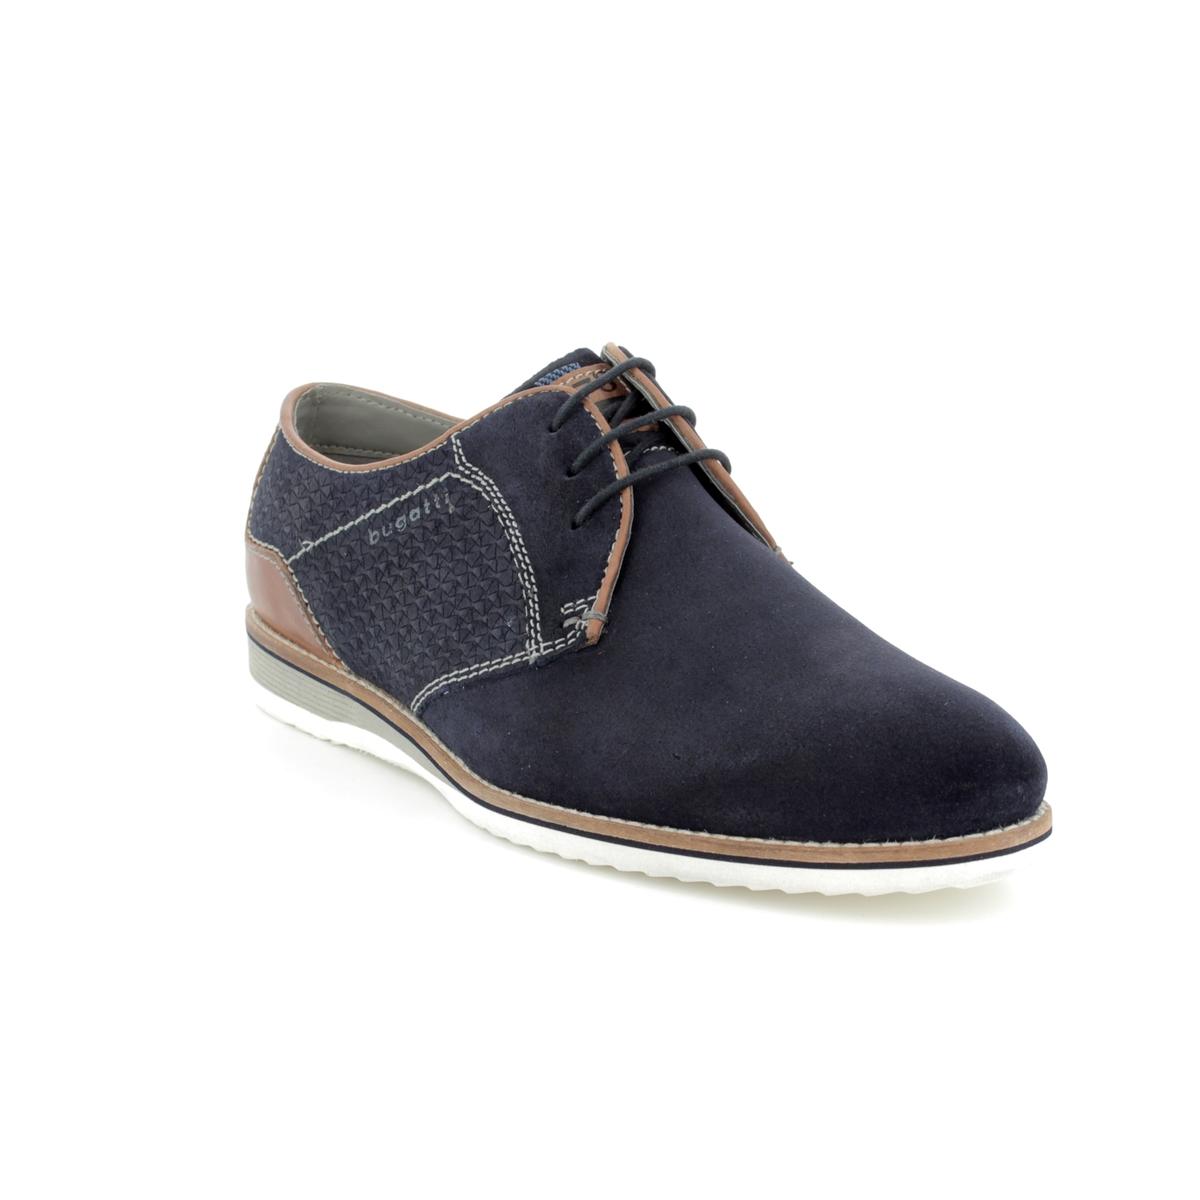 877d9897a54 Bugatti Fashion Shoes - Navy - 31145402 4100 CONTE LIGHT